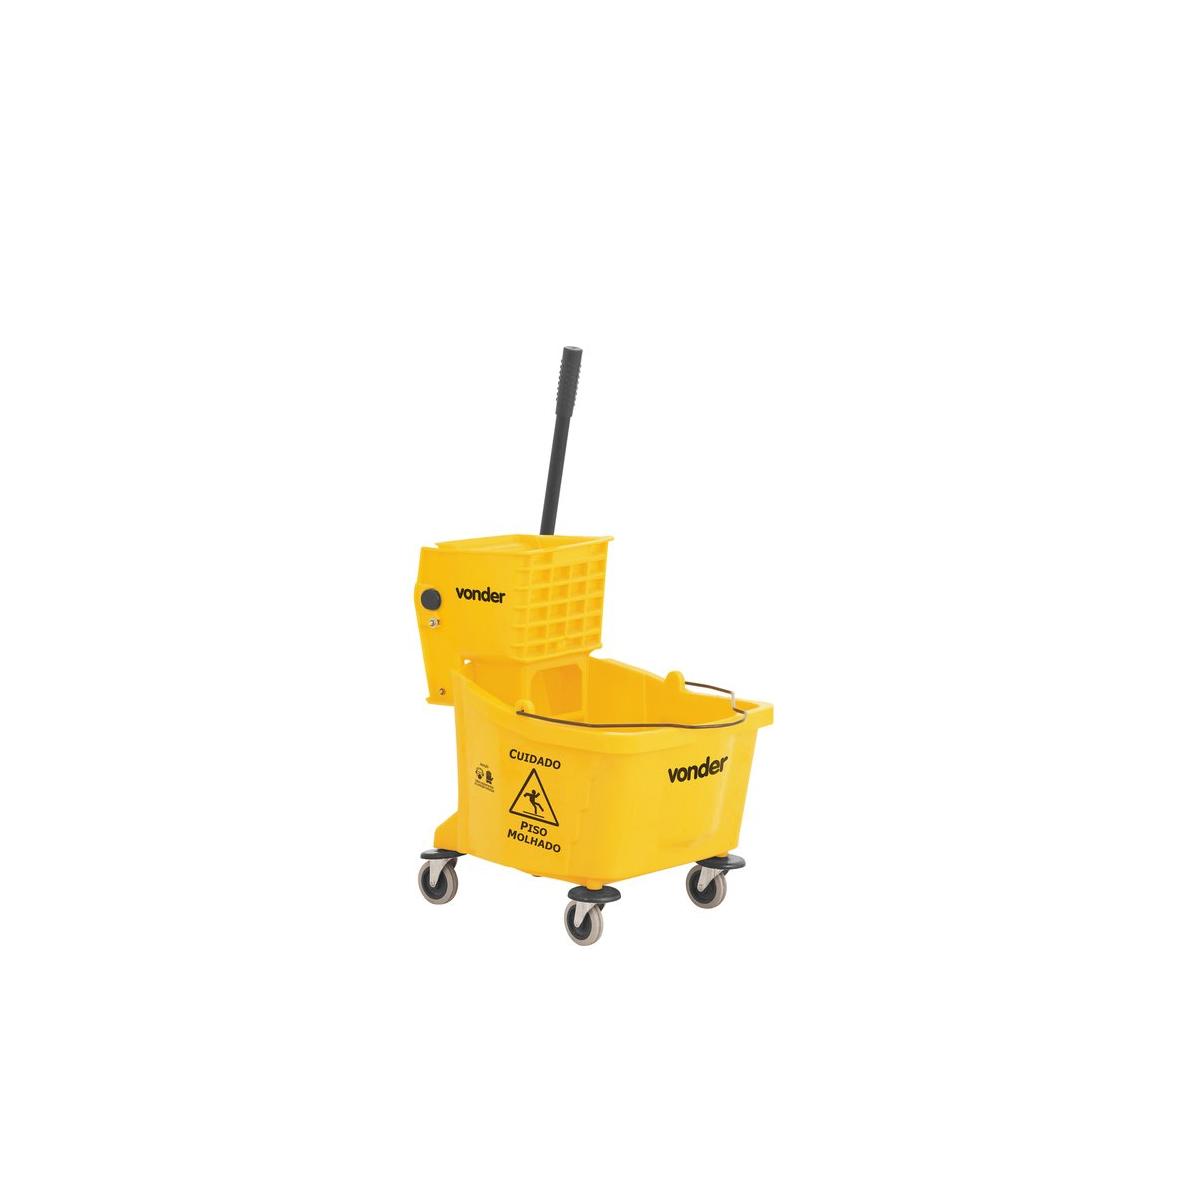 Carro/balde plástico para limpeza com espremedor 32 litros BEV 3200 VONDER